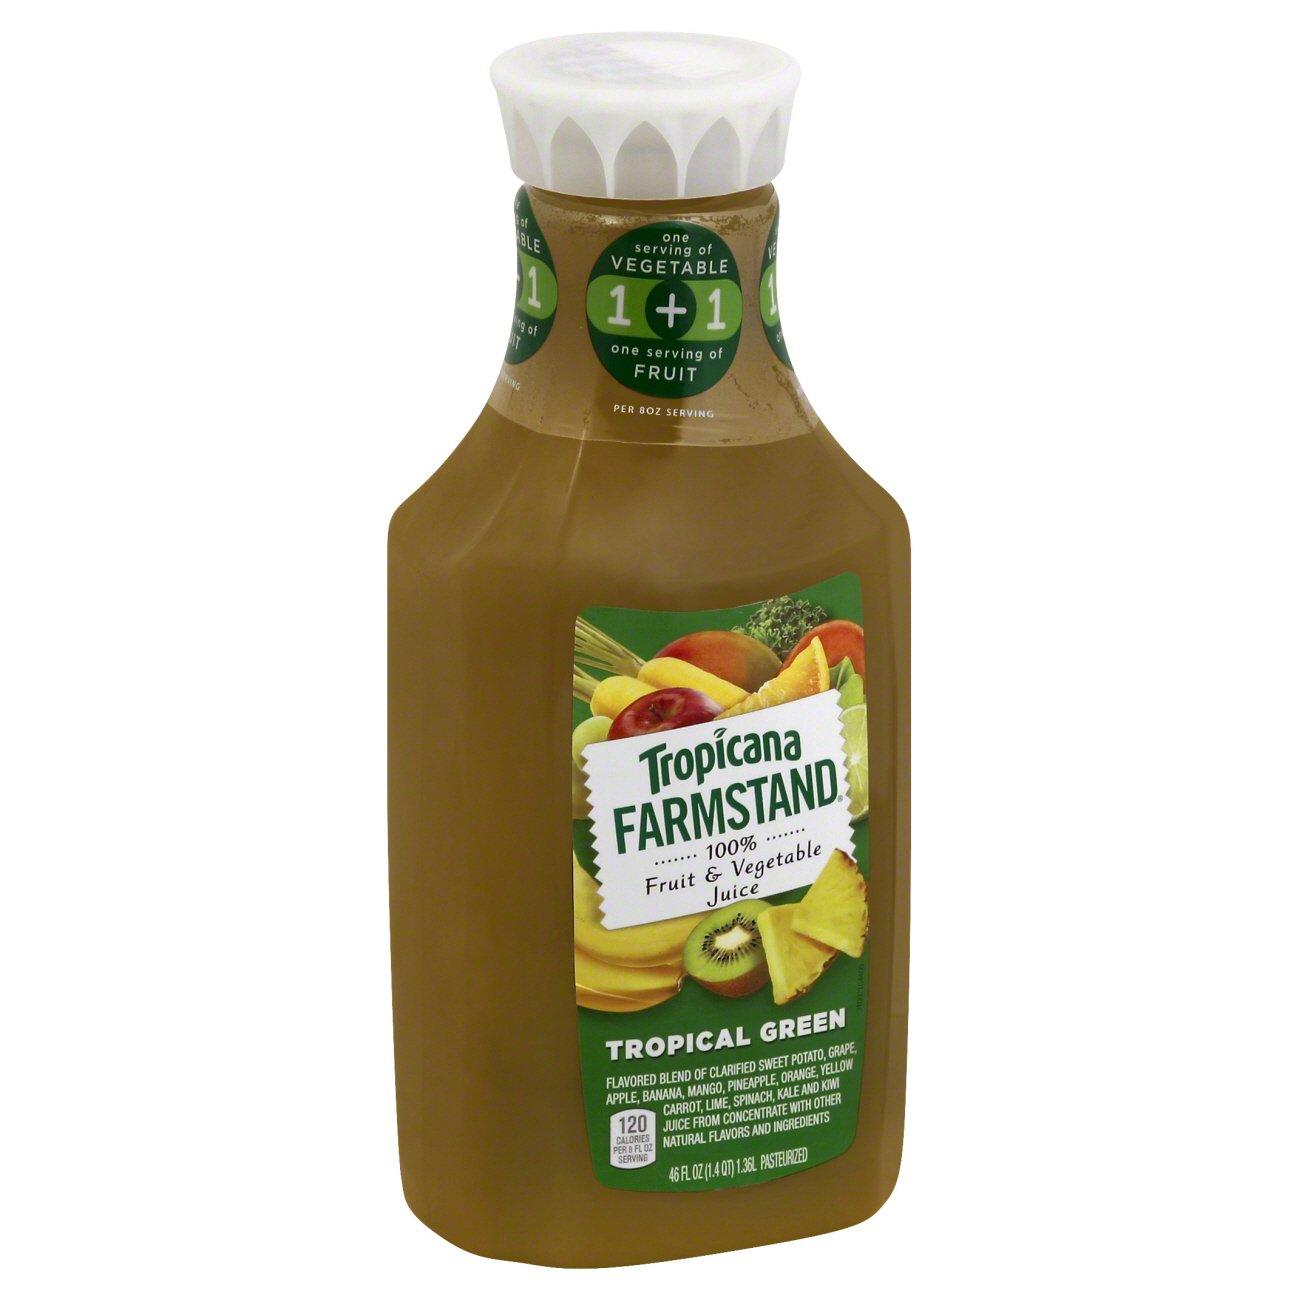 Tropicana Farmstand Nutrition – Nutrition Ftempo